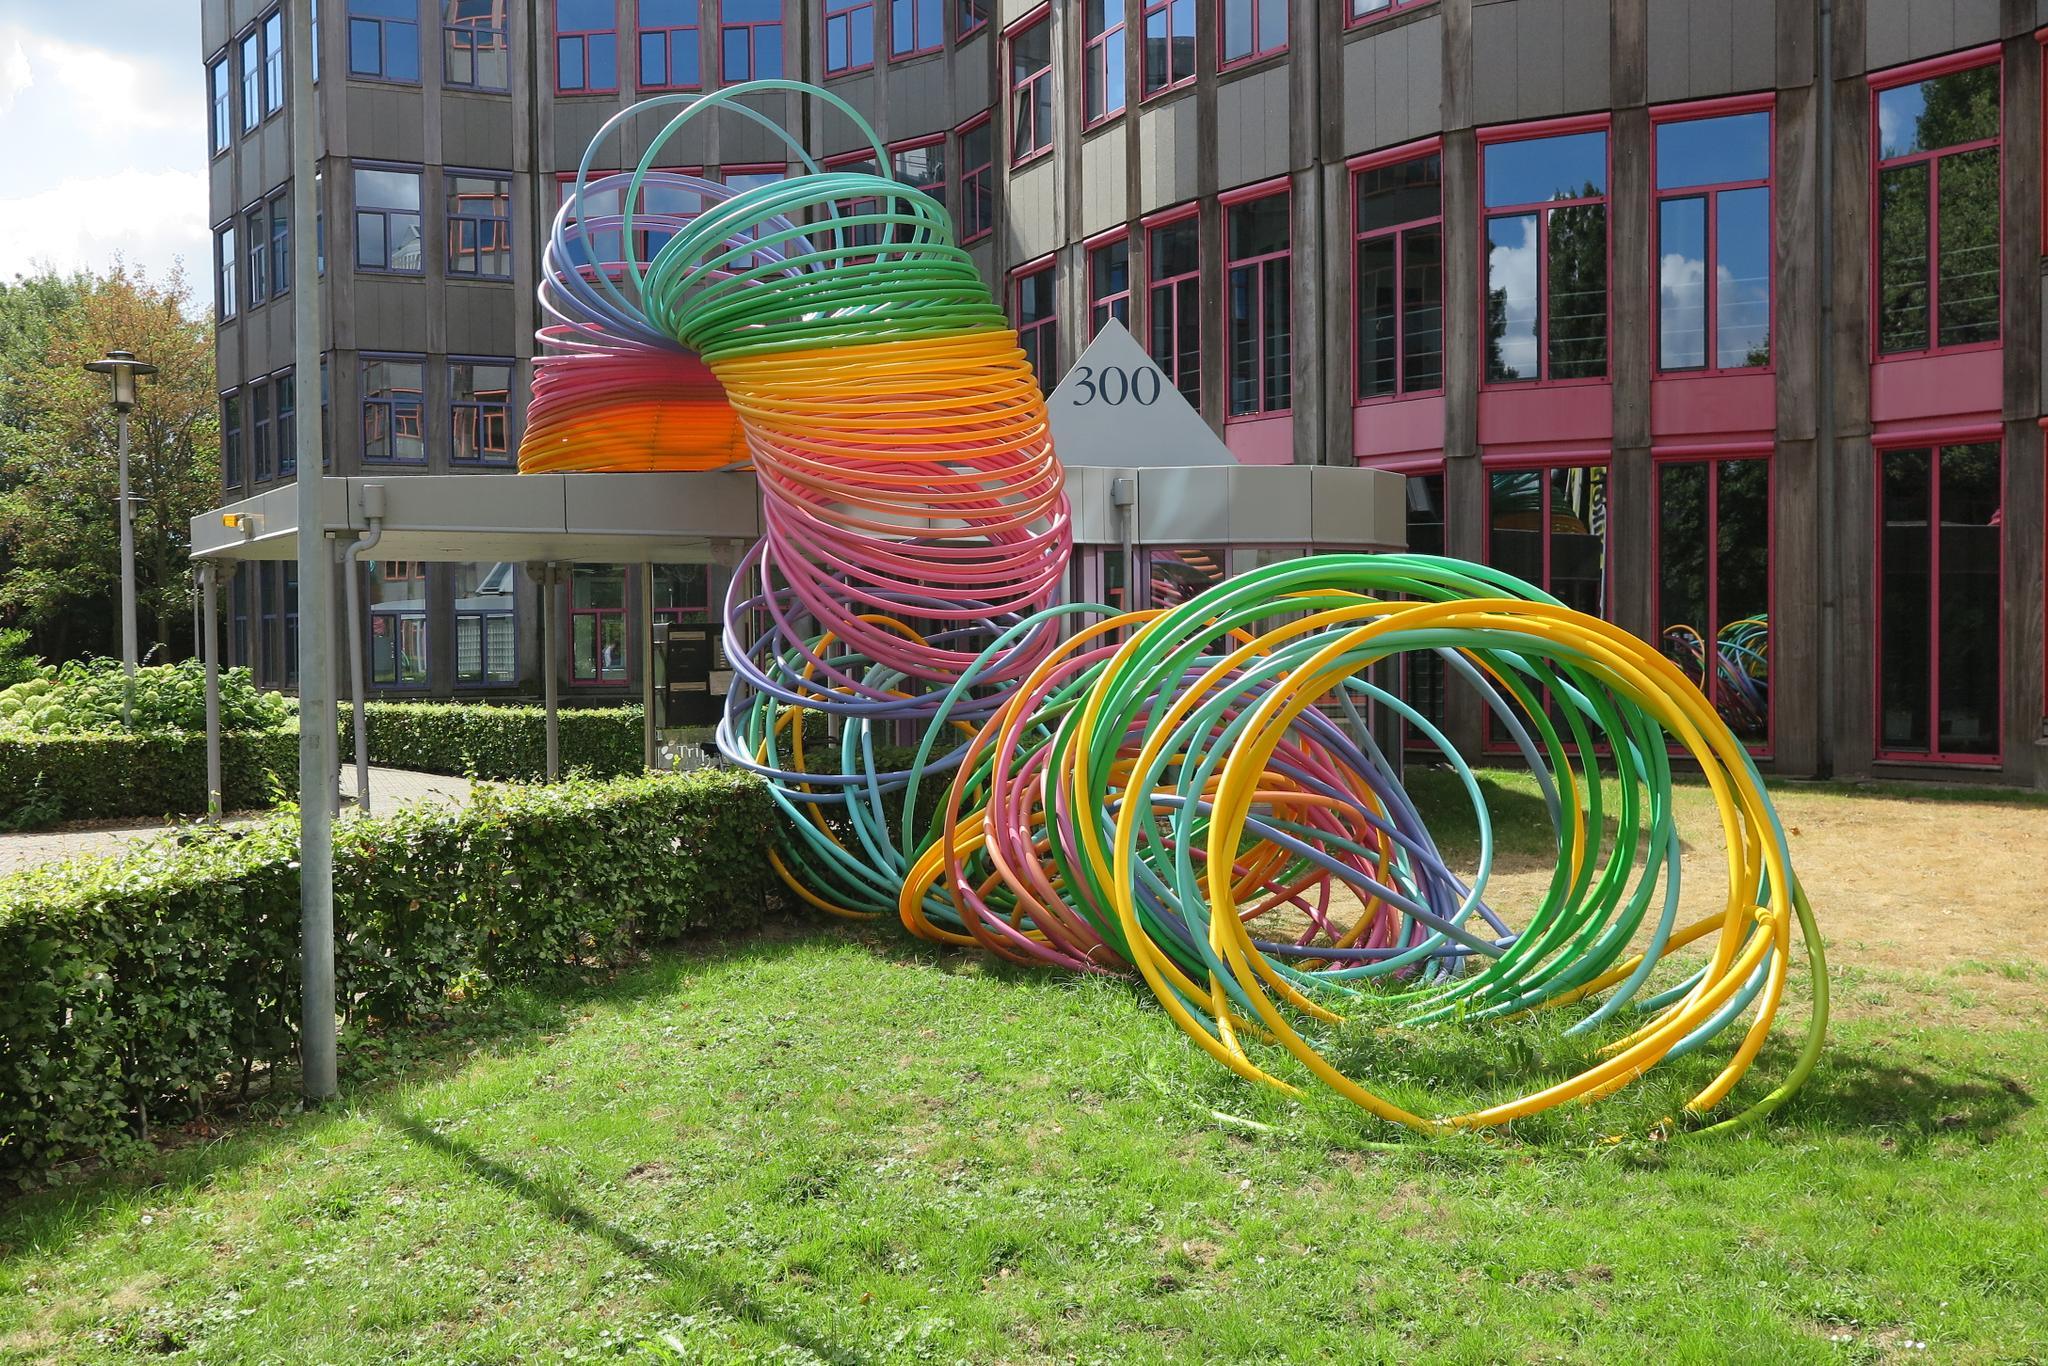 Slinky - Simon Wald Lasowski